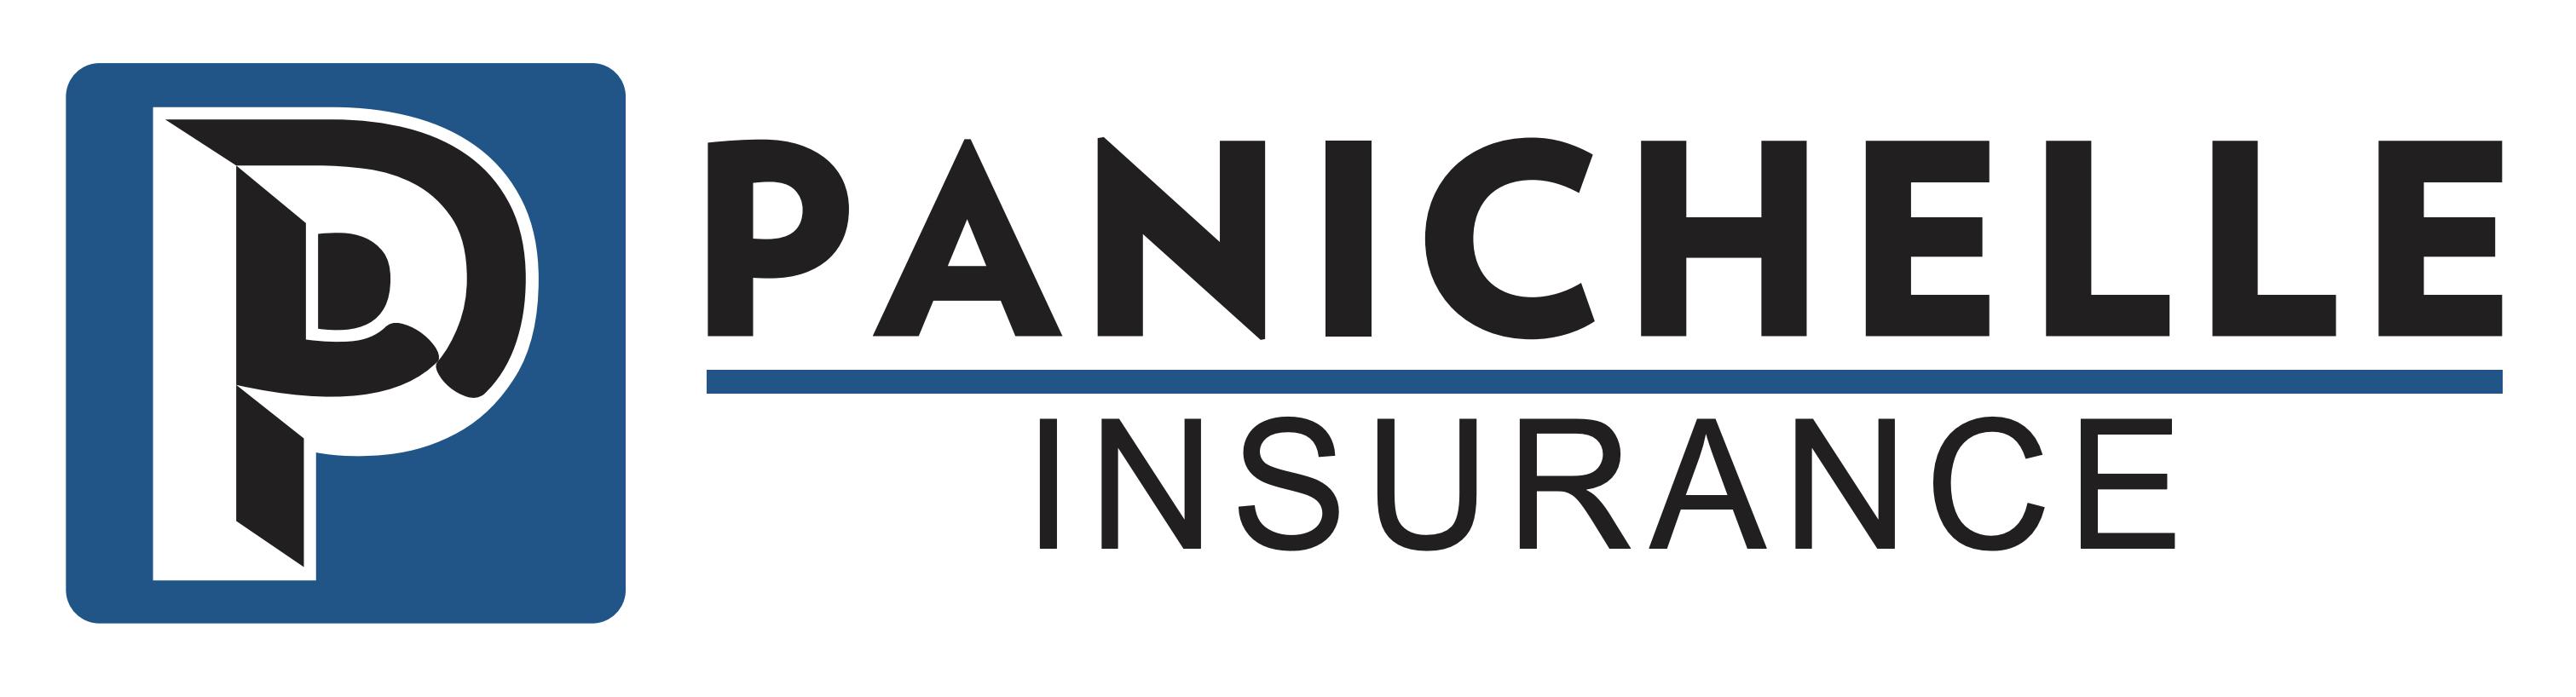 Panichelle Insurance